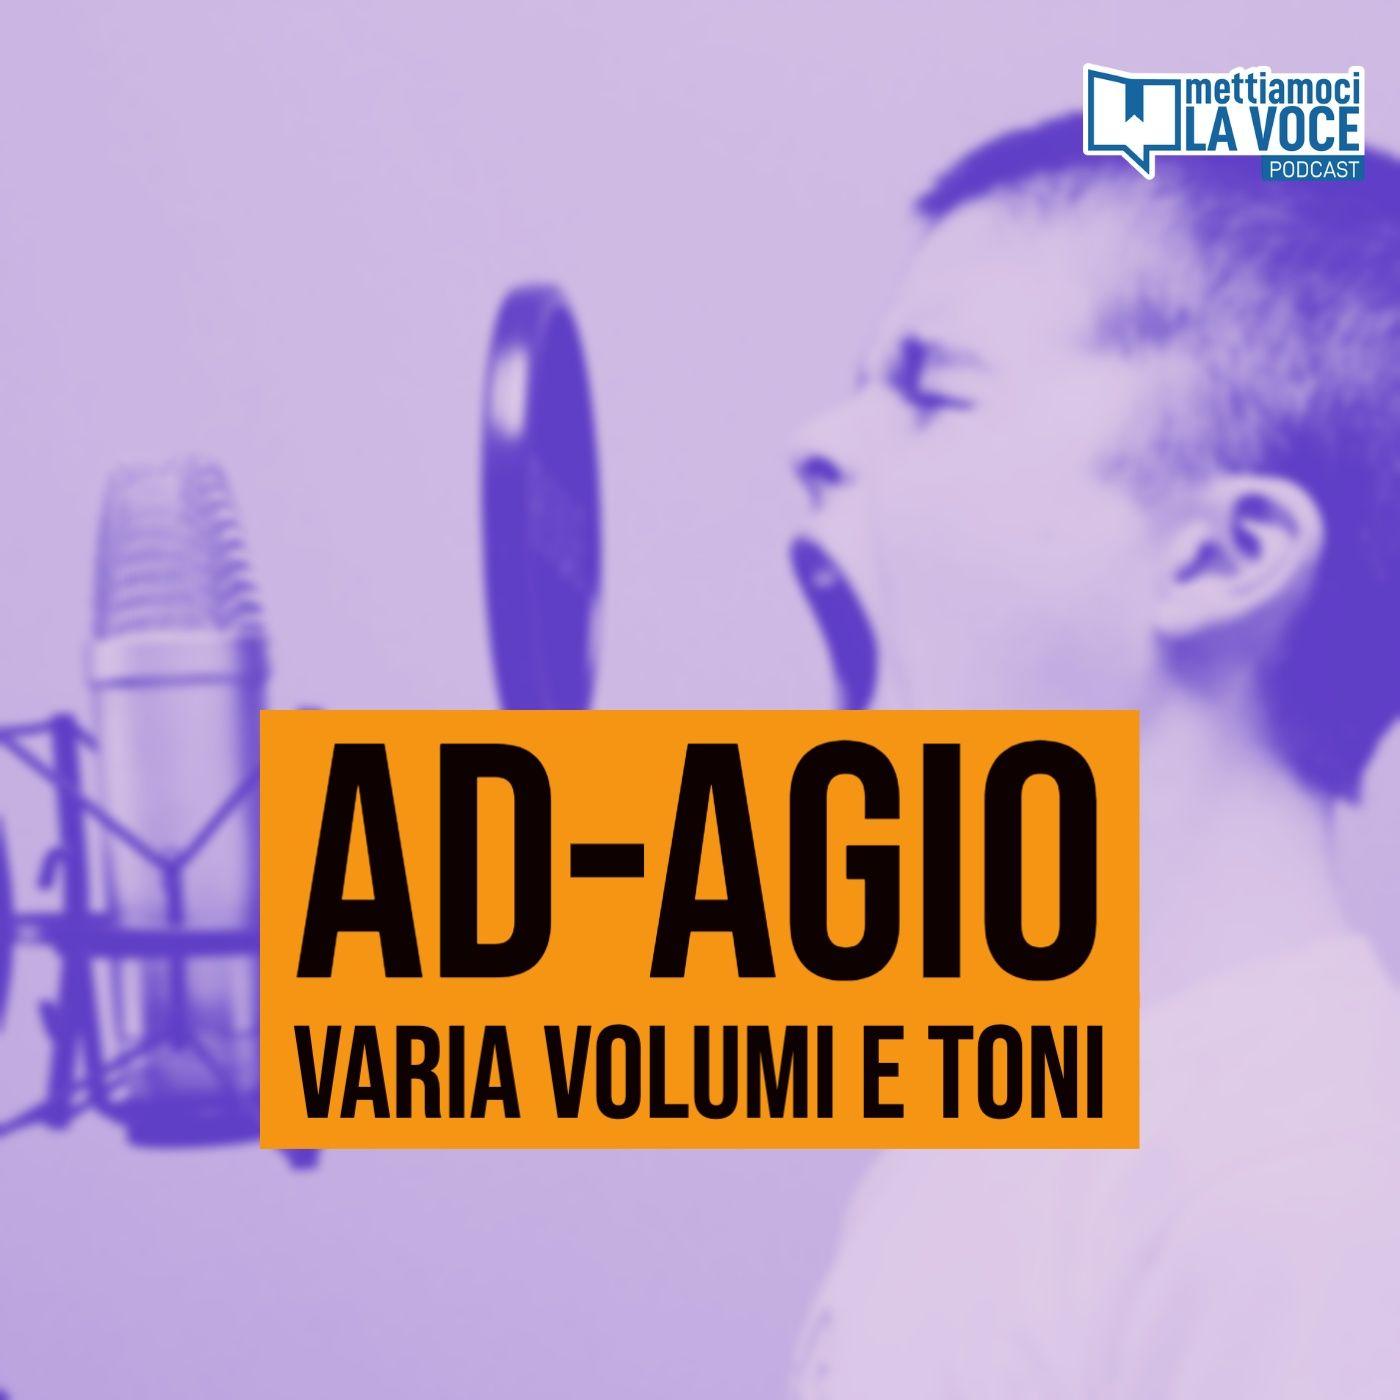 180 - Varia volumi e toni [Metodo AD-AGIO]